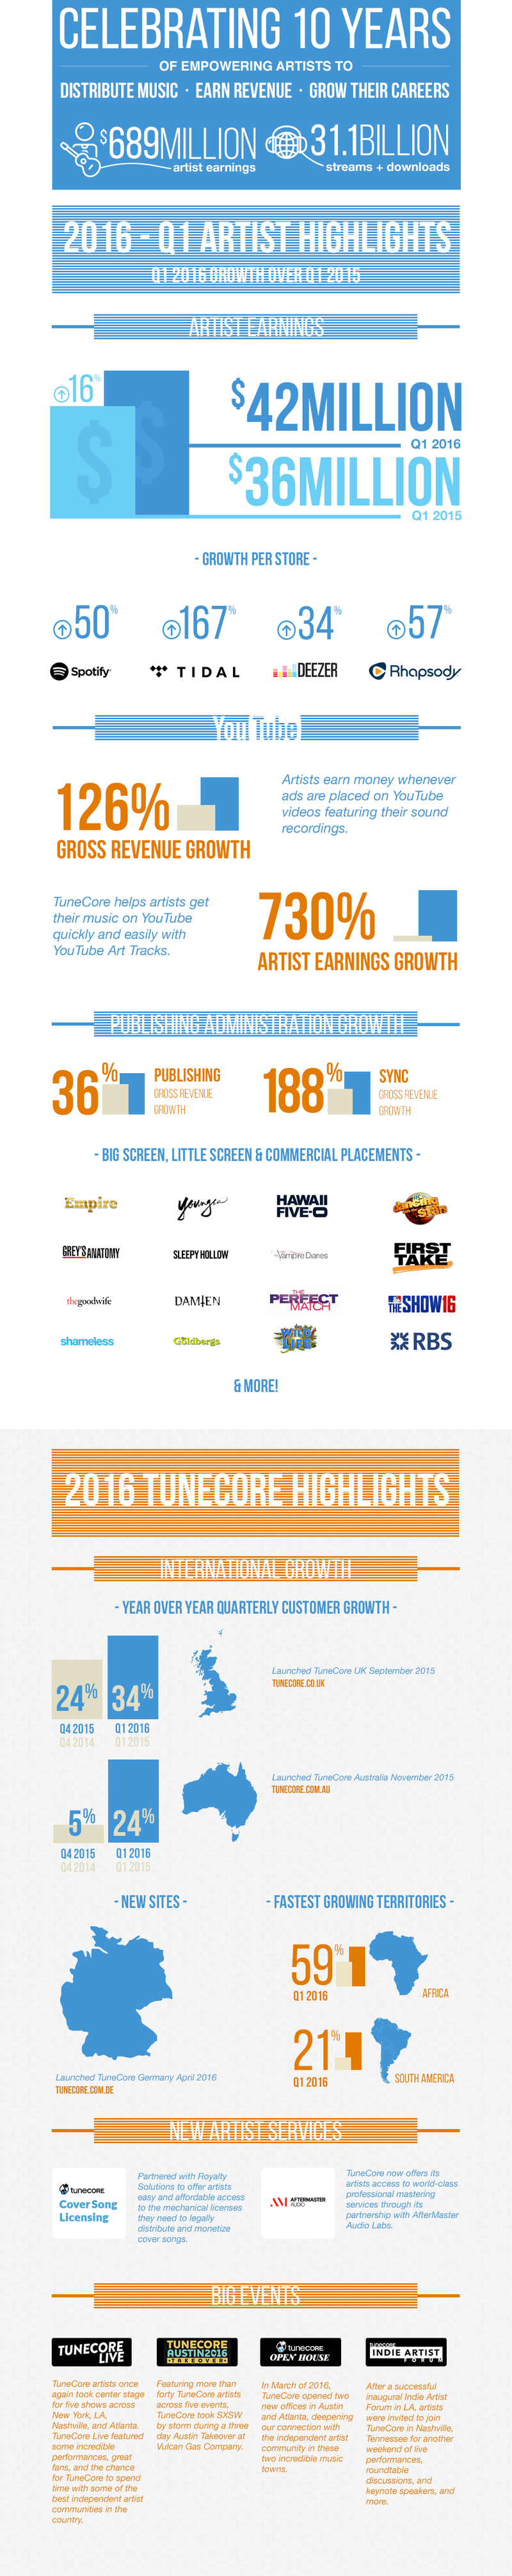 image from www.tunecore.com